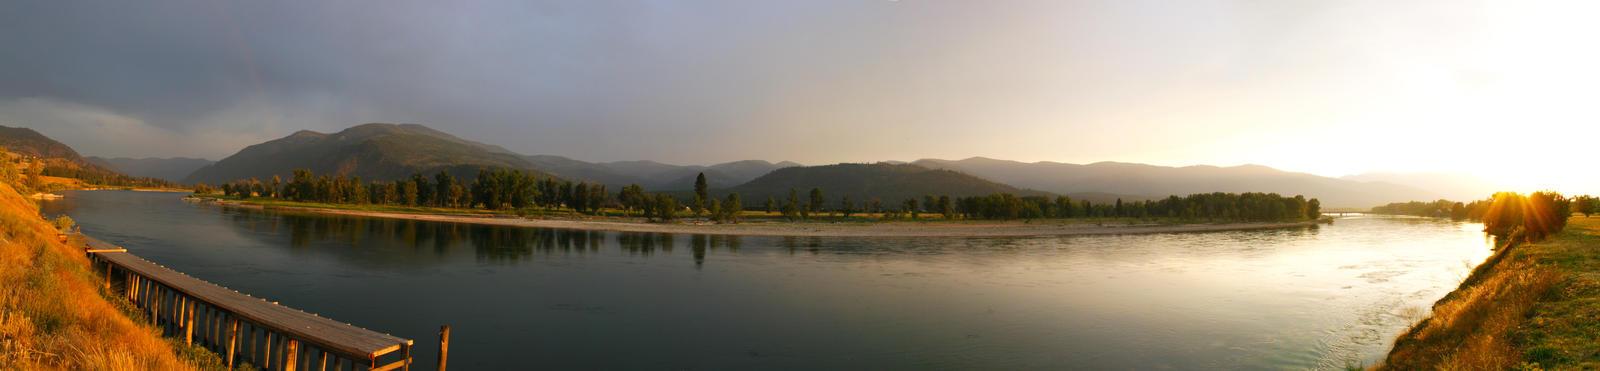 Plains Montana by Halcyon1990